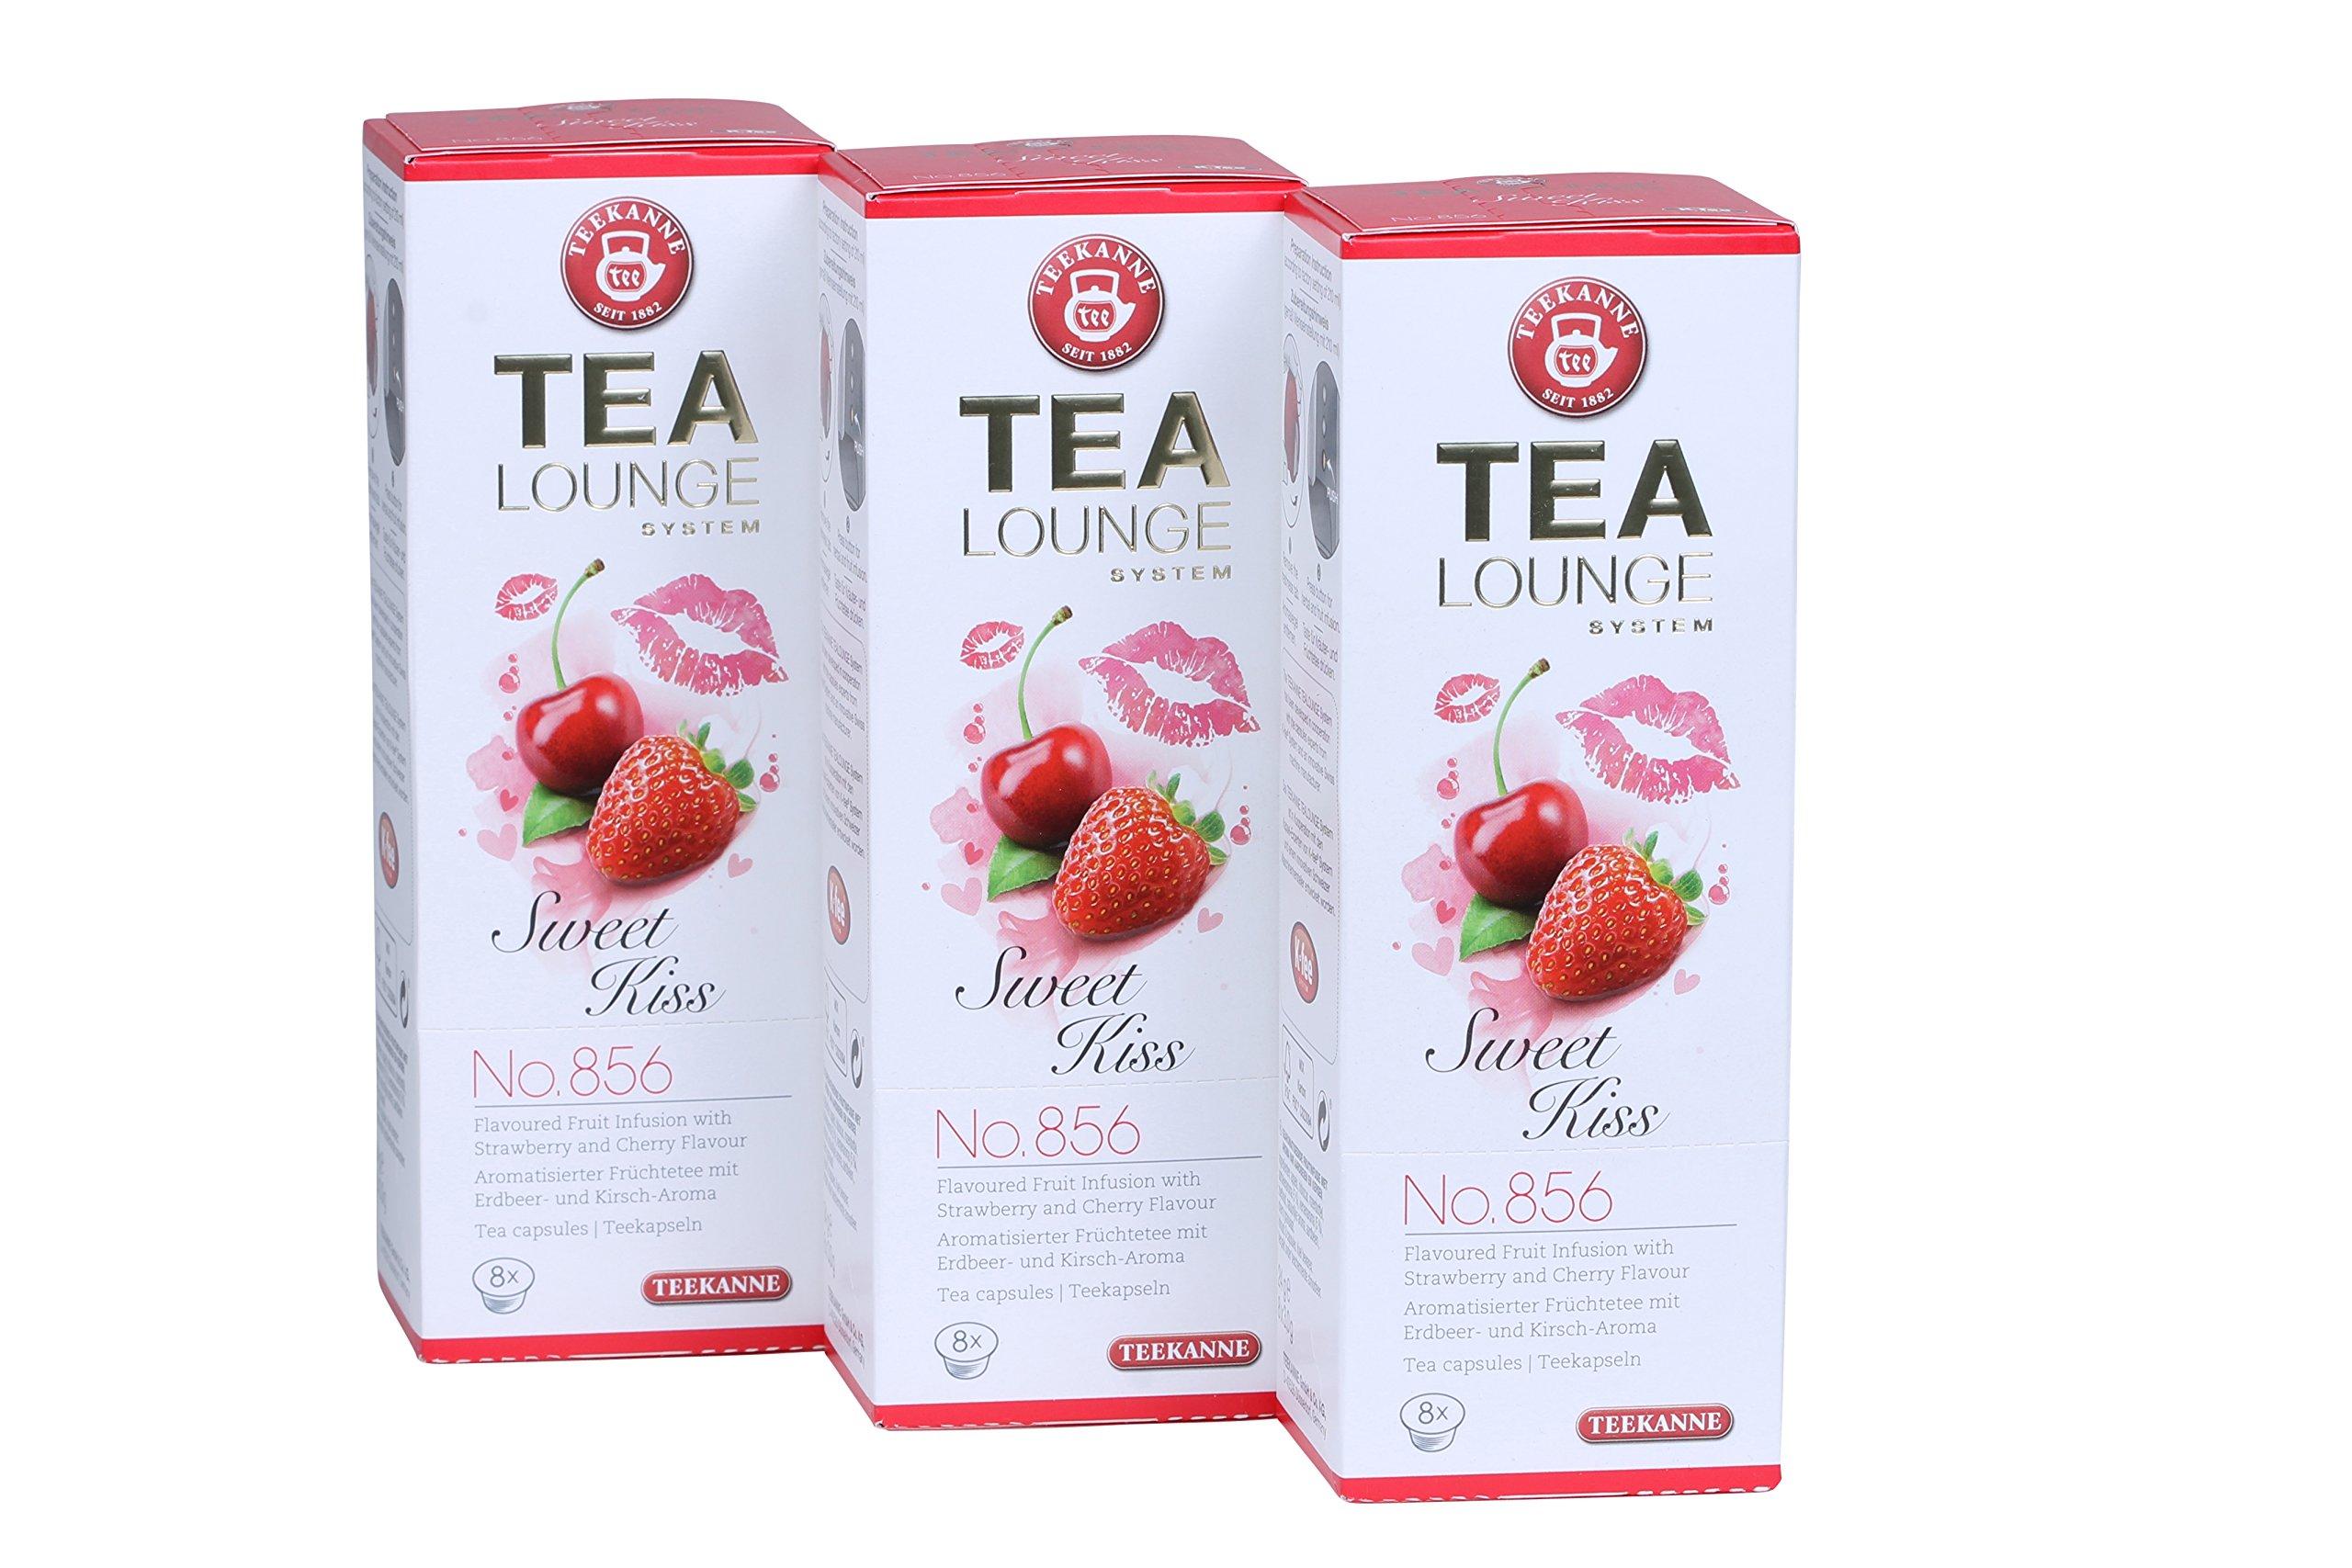 Teekanne-Tealounge-Kapseln-Sweet-Kiss-No-856-K-Fee-3er-Pack-24-Kapseln